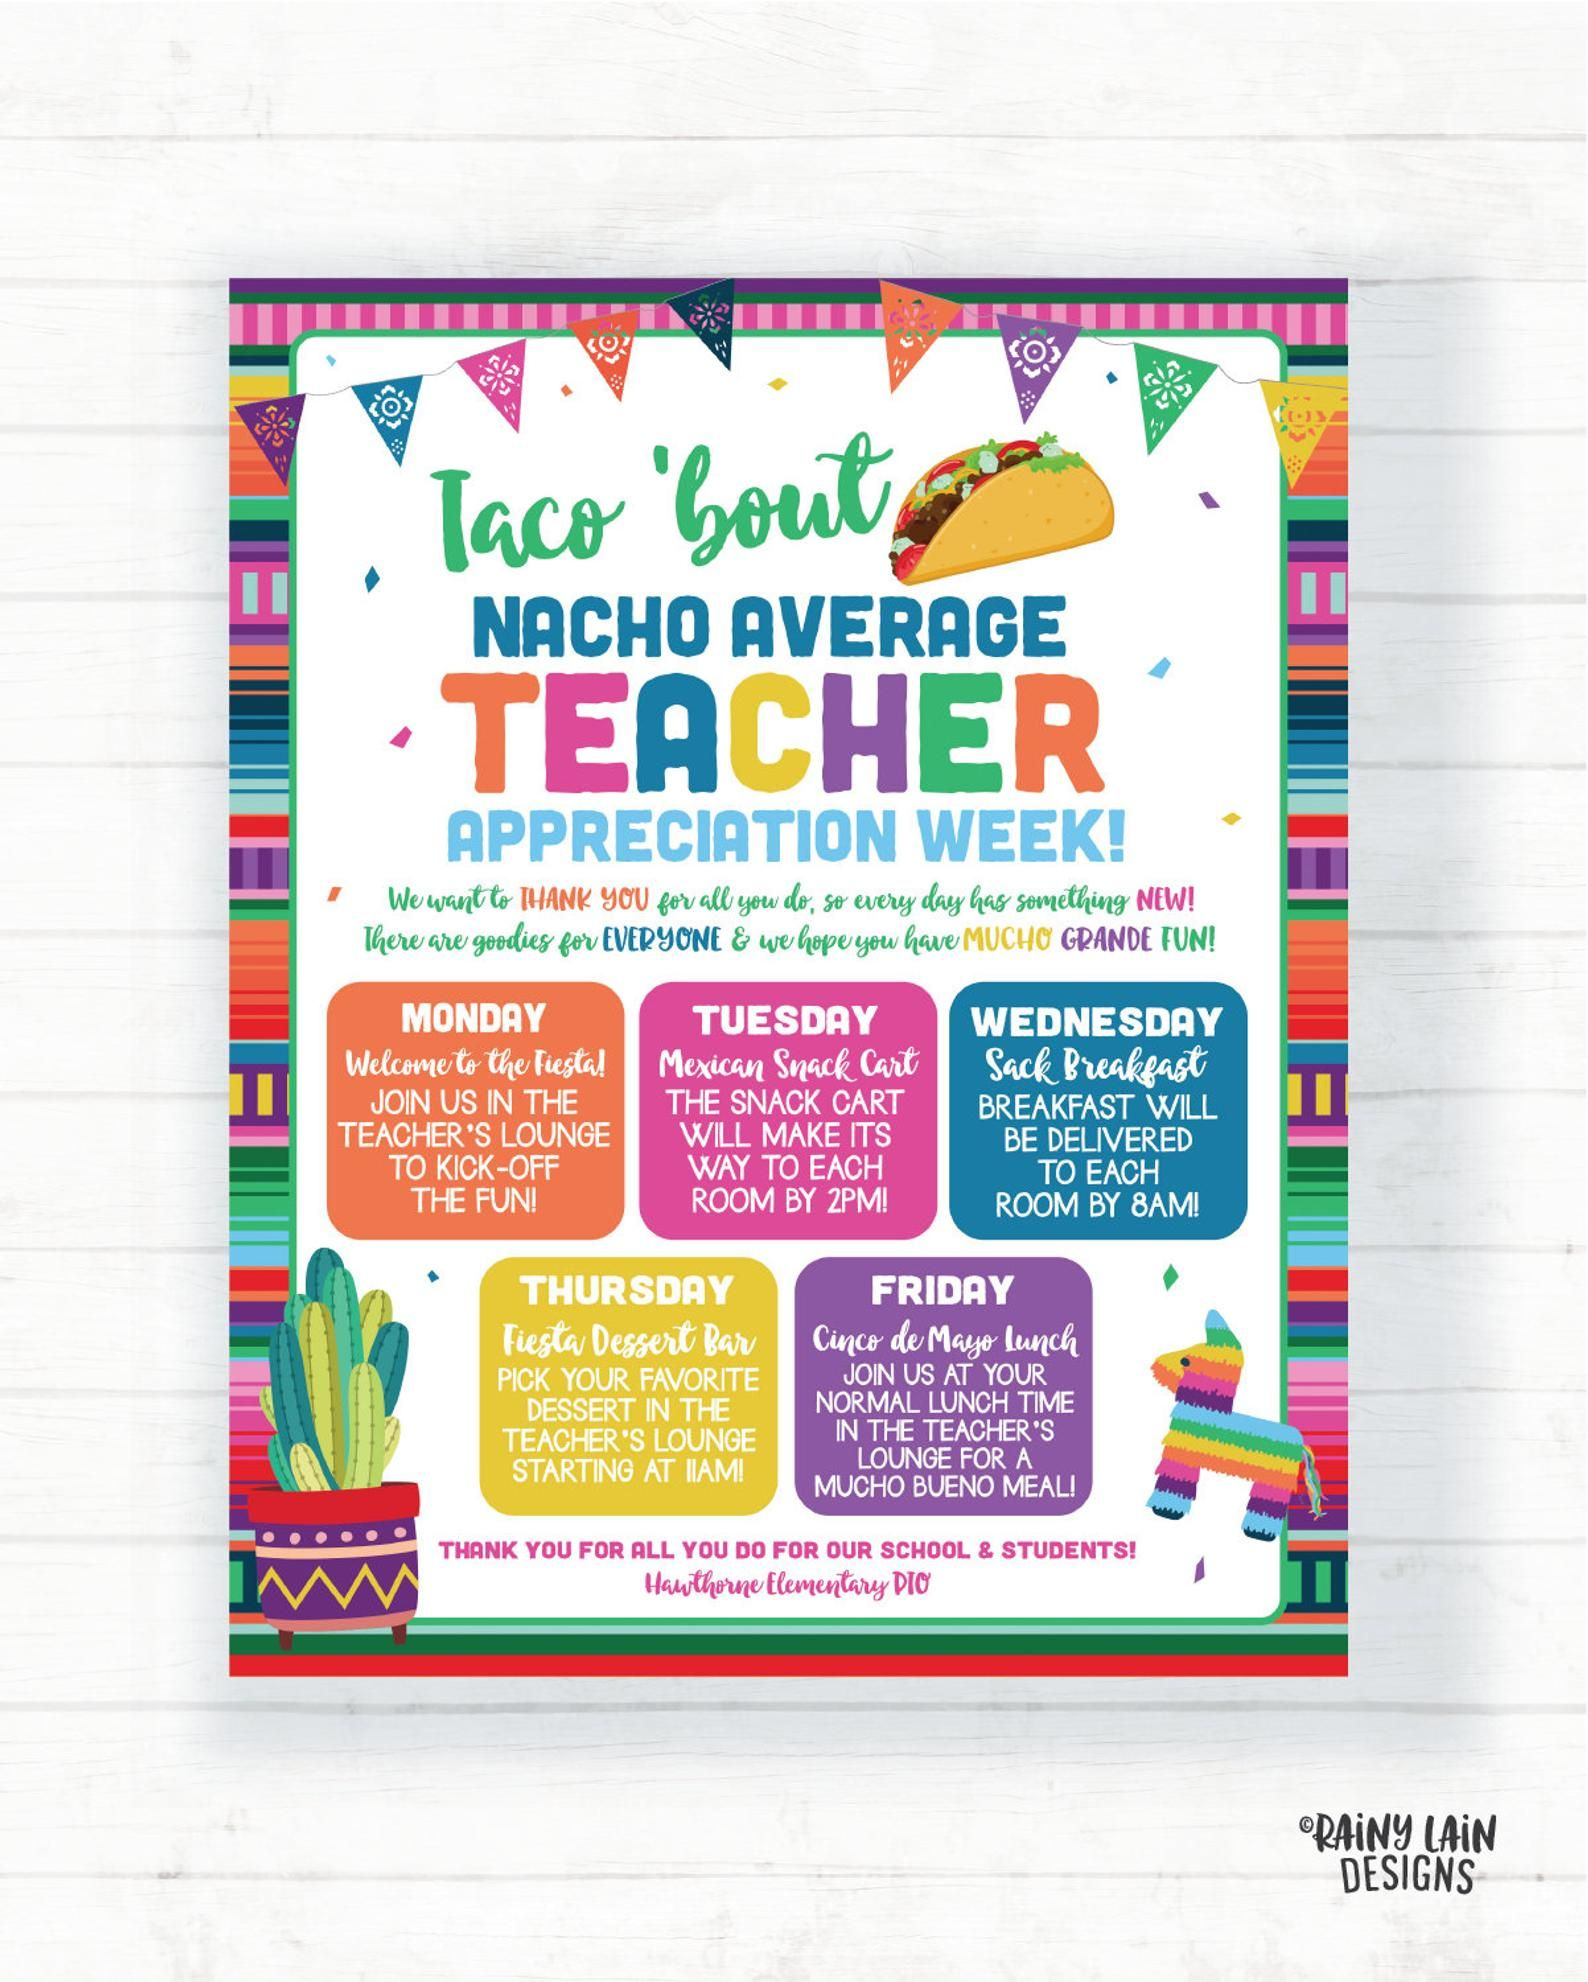 Teacher Appreciation Week Schedule Teacher Appreciation Etsy Teacher Appreciation Week Themes Teacher Appreciation Week Schedule Teacher Appreciation Week